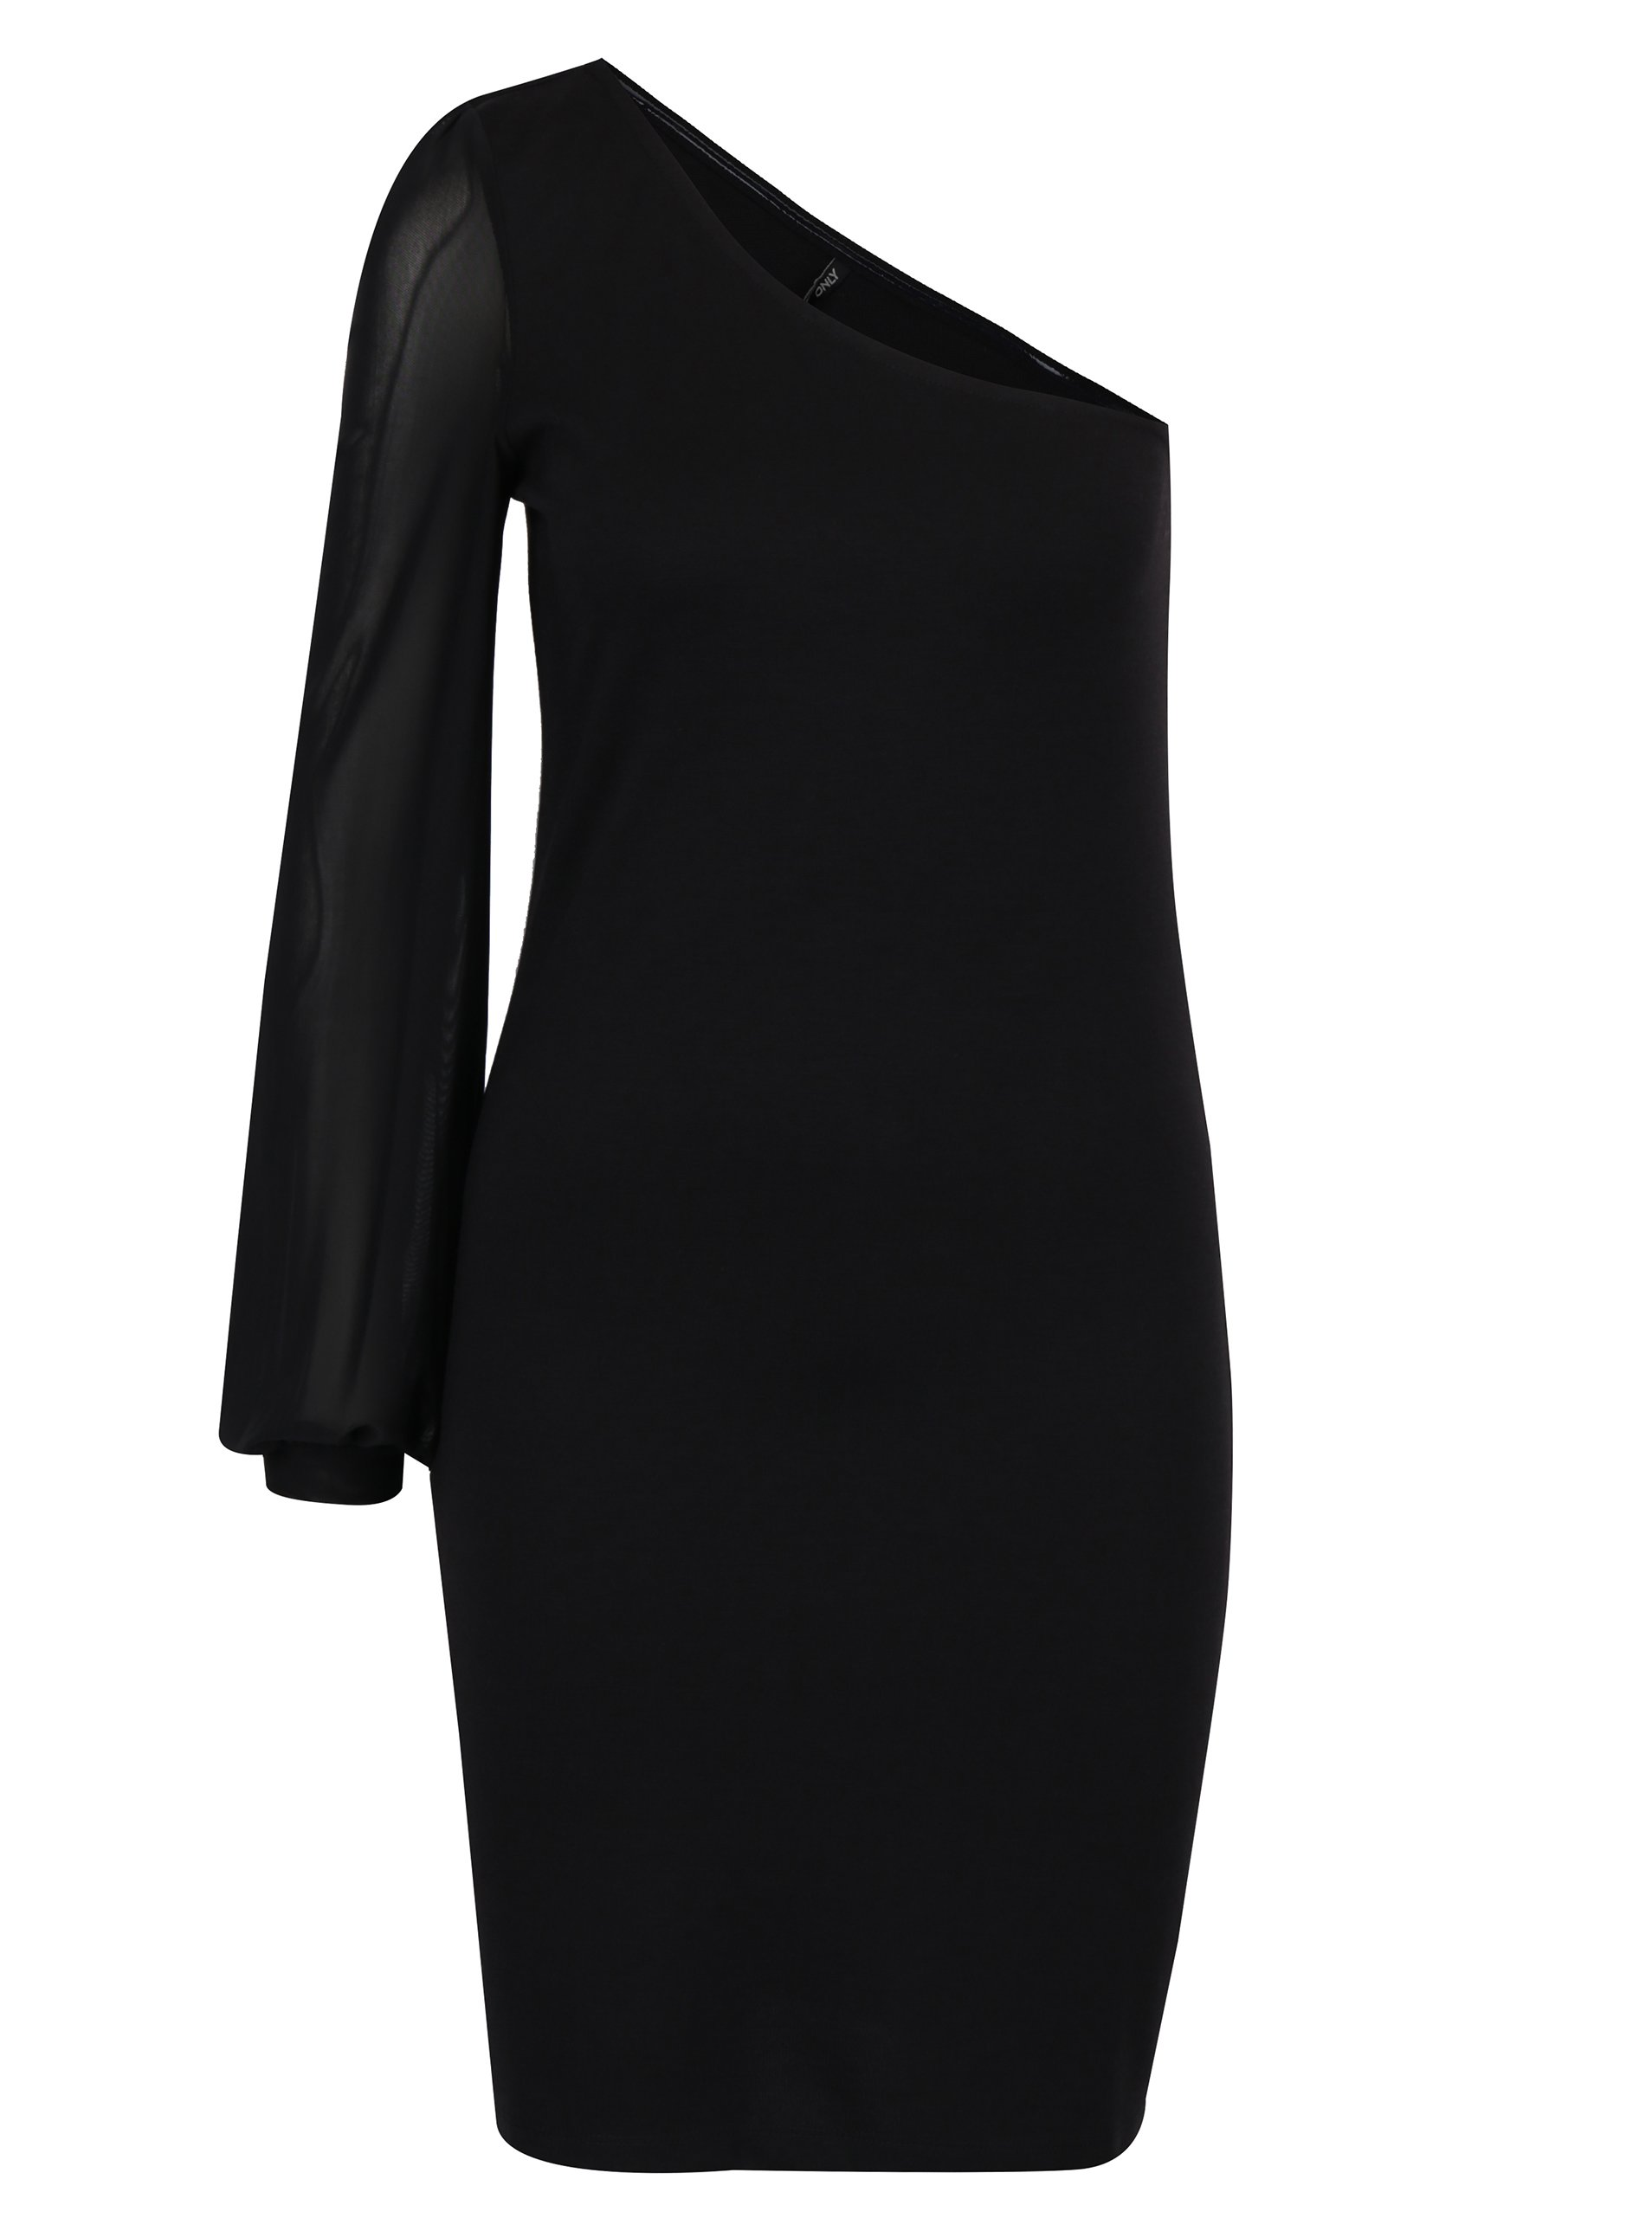 Černé asymetrické šaty s průsvitným rukávem ONLY Victoria